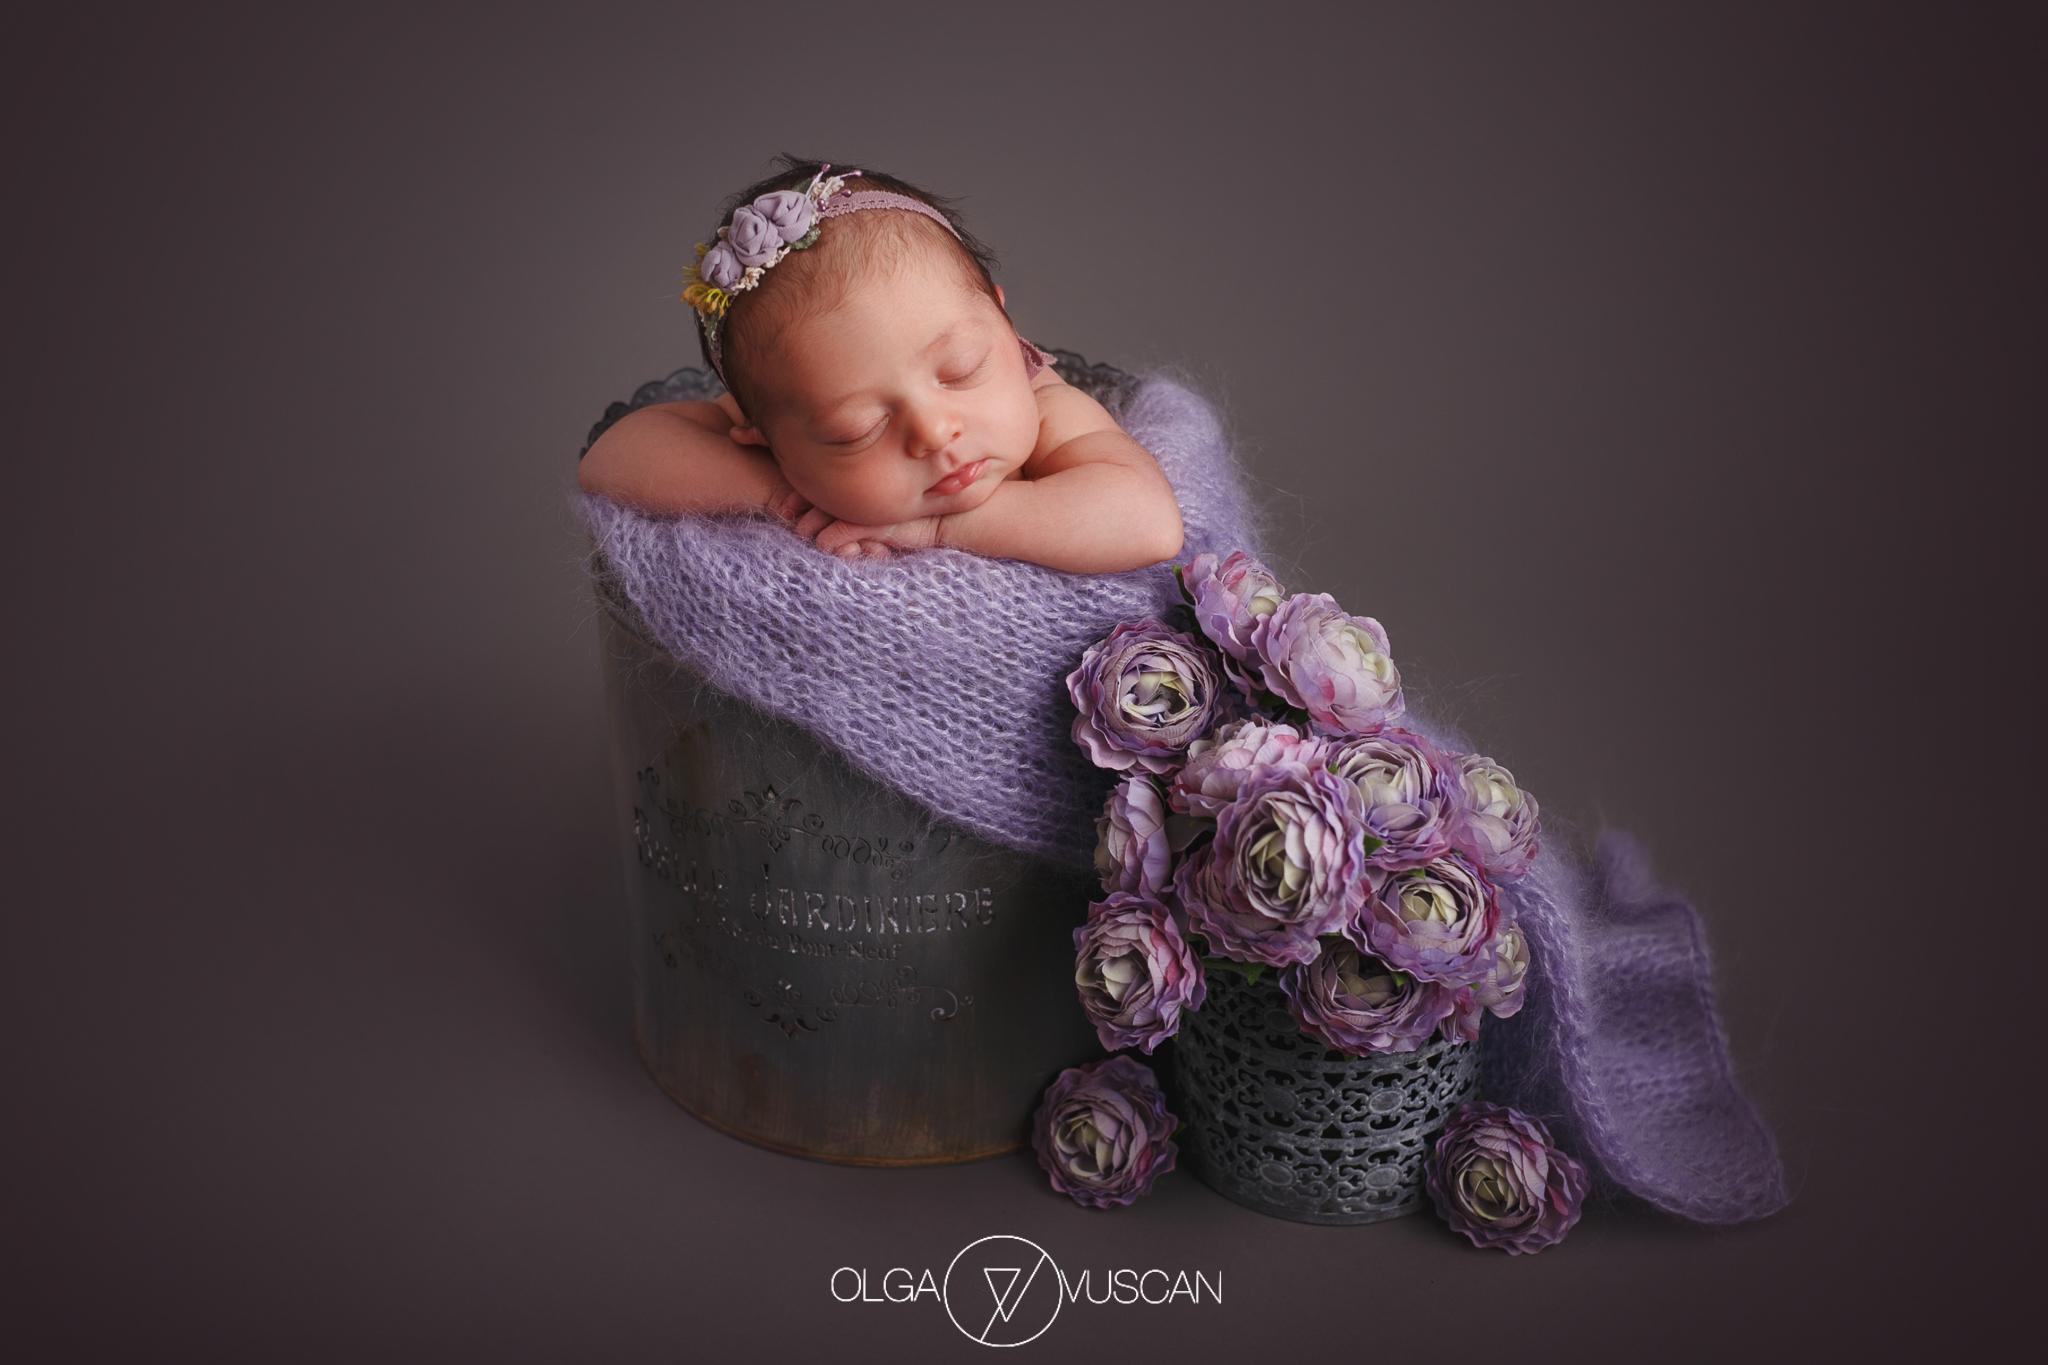 sedinta foto nou-nascut, fotograf profesionist copii, fotograf nou-nascuti Cluj, fotograf copii Cluj Olga Vuscan